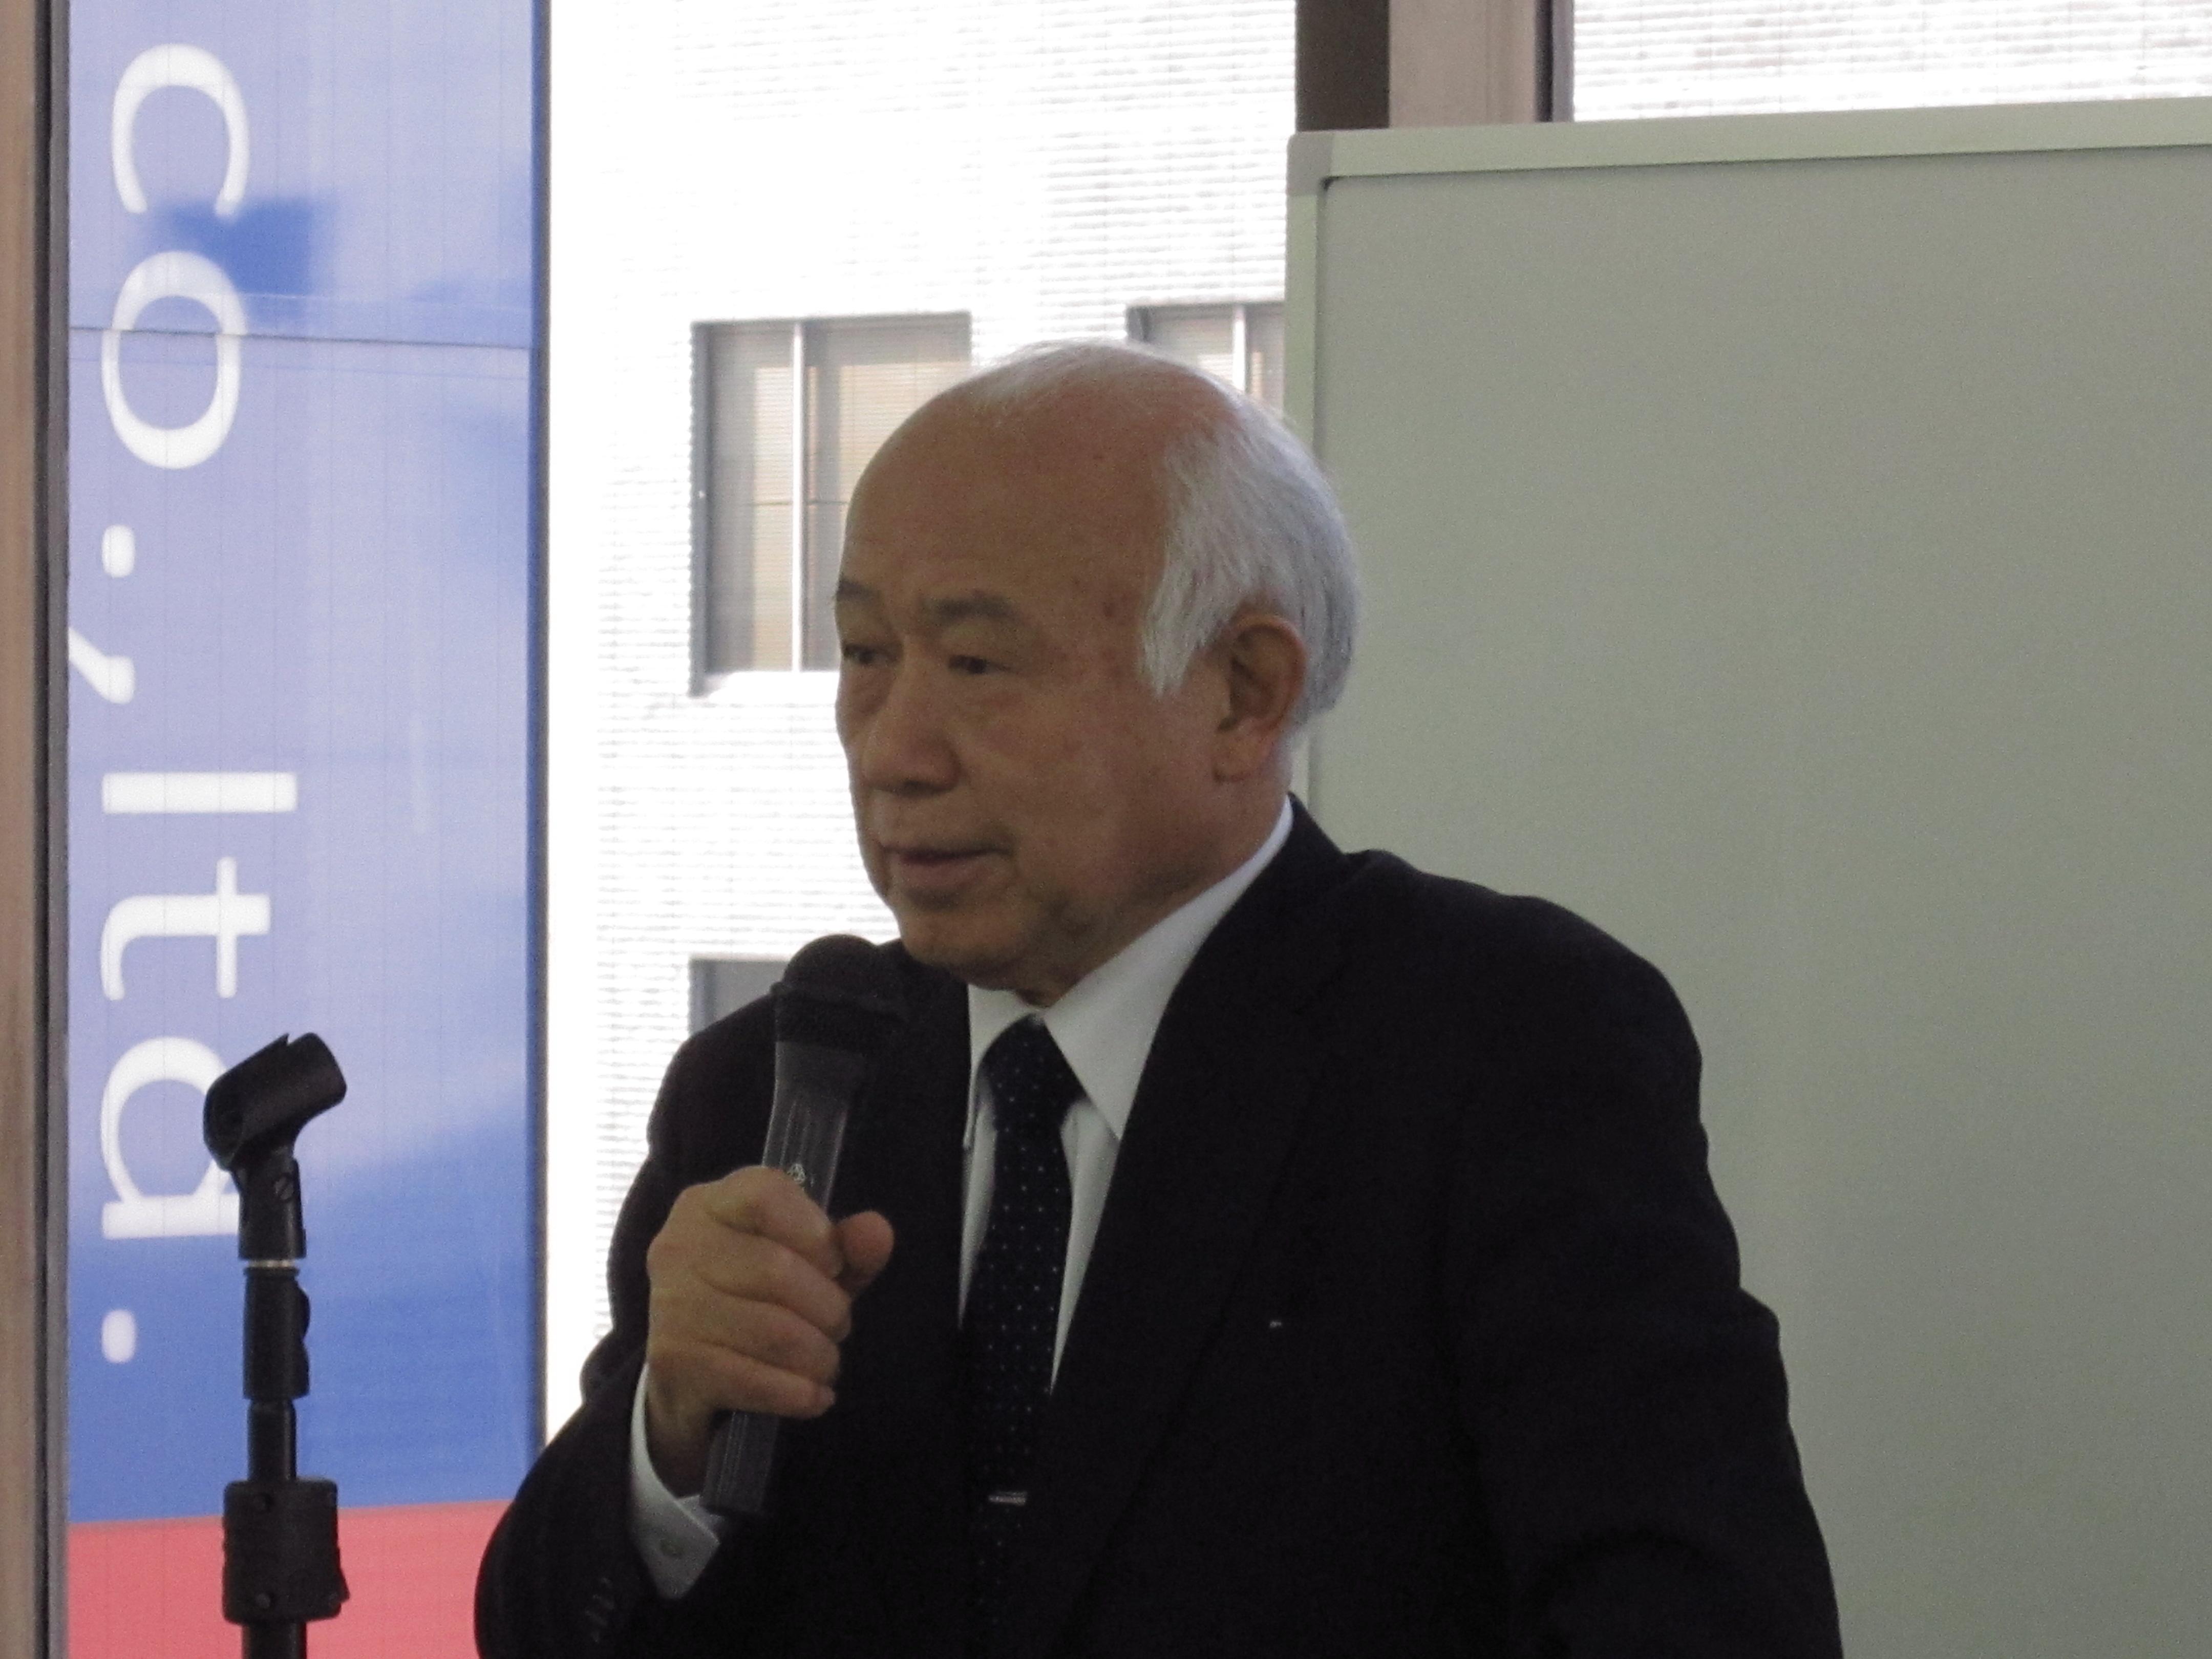 IMG 5592 - 4月1日東京思風塾の開催になります。